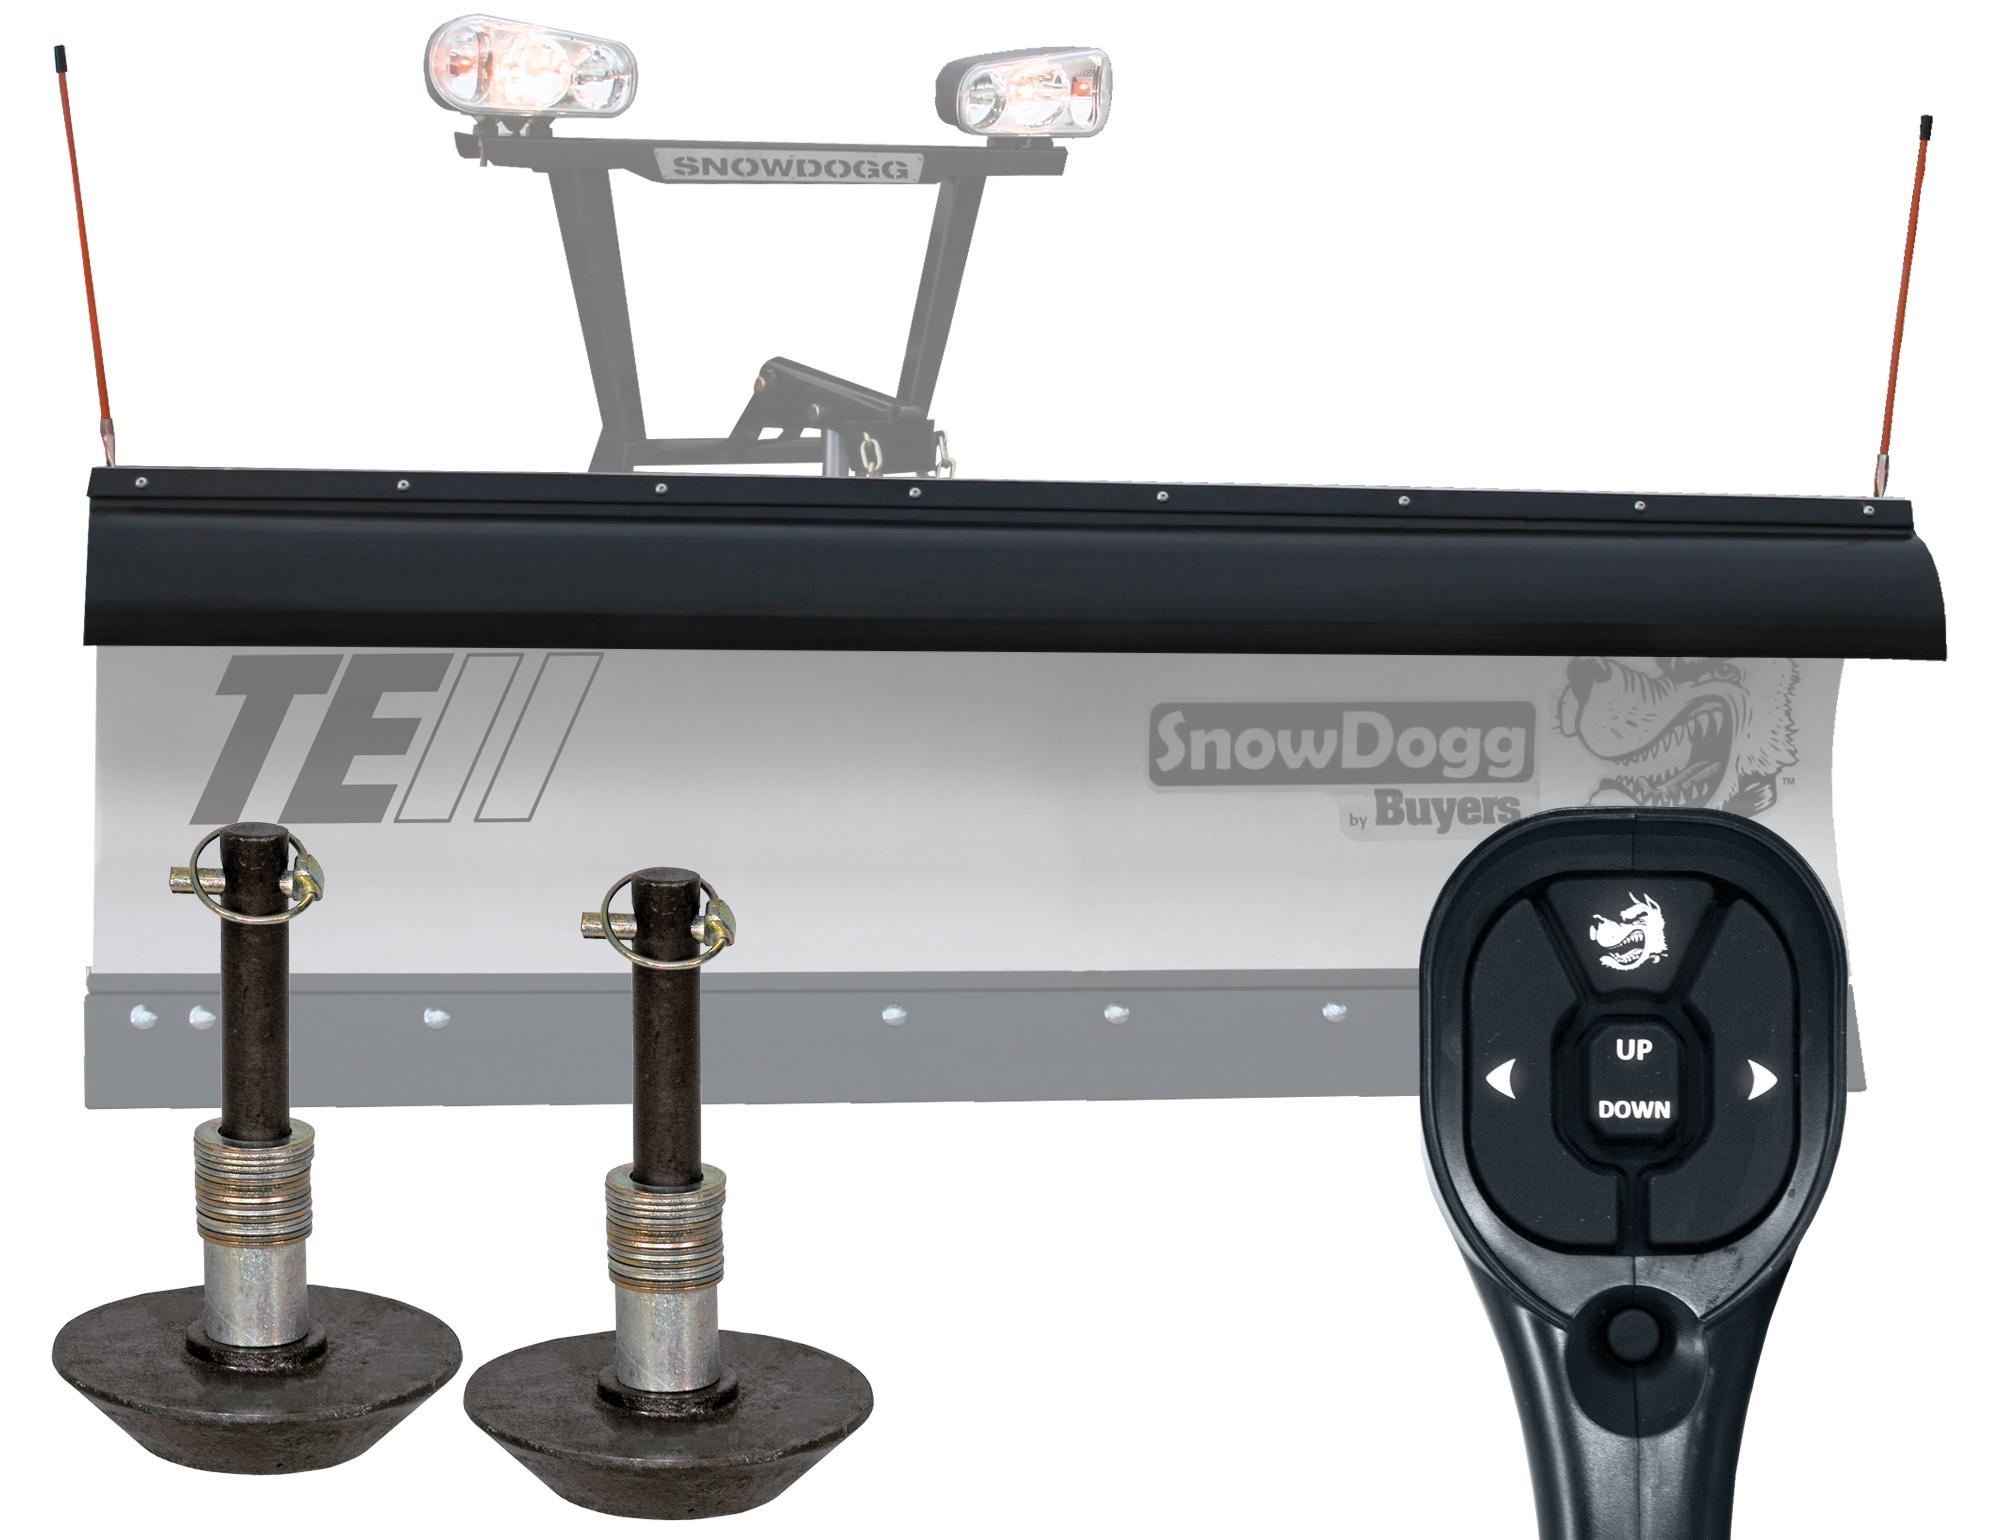 New Buyers TE80II Model, Straight blade, Trip edge Stainless Steel Straight Blade, Standard